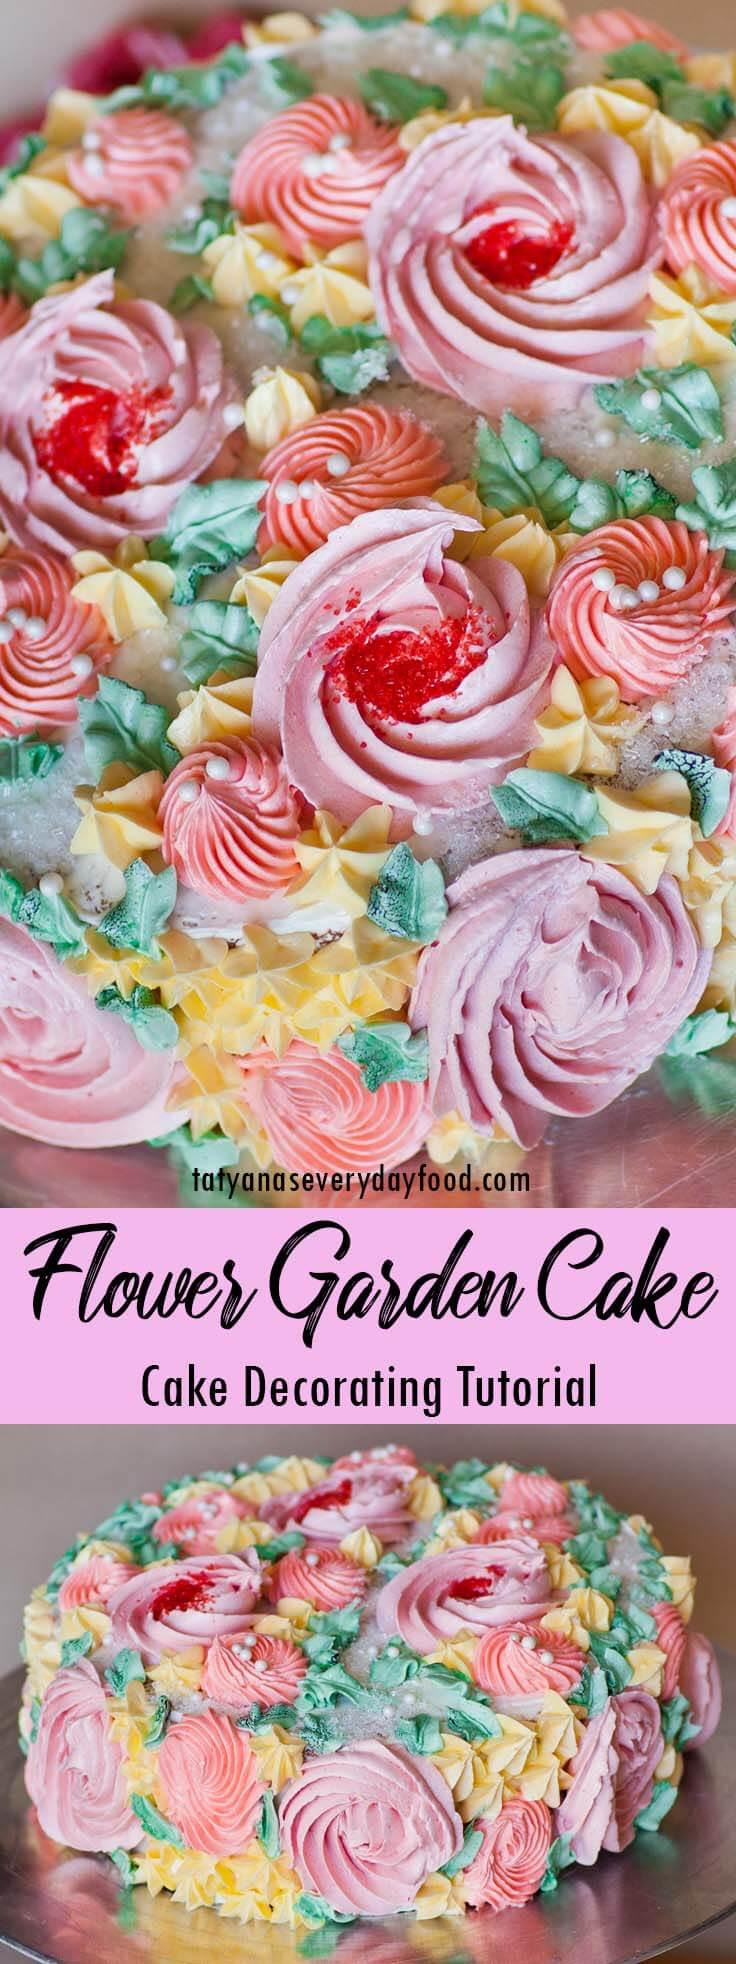 Flower Garden Cake Decorating video tutorial